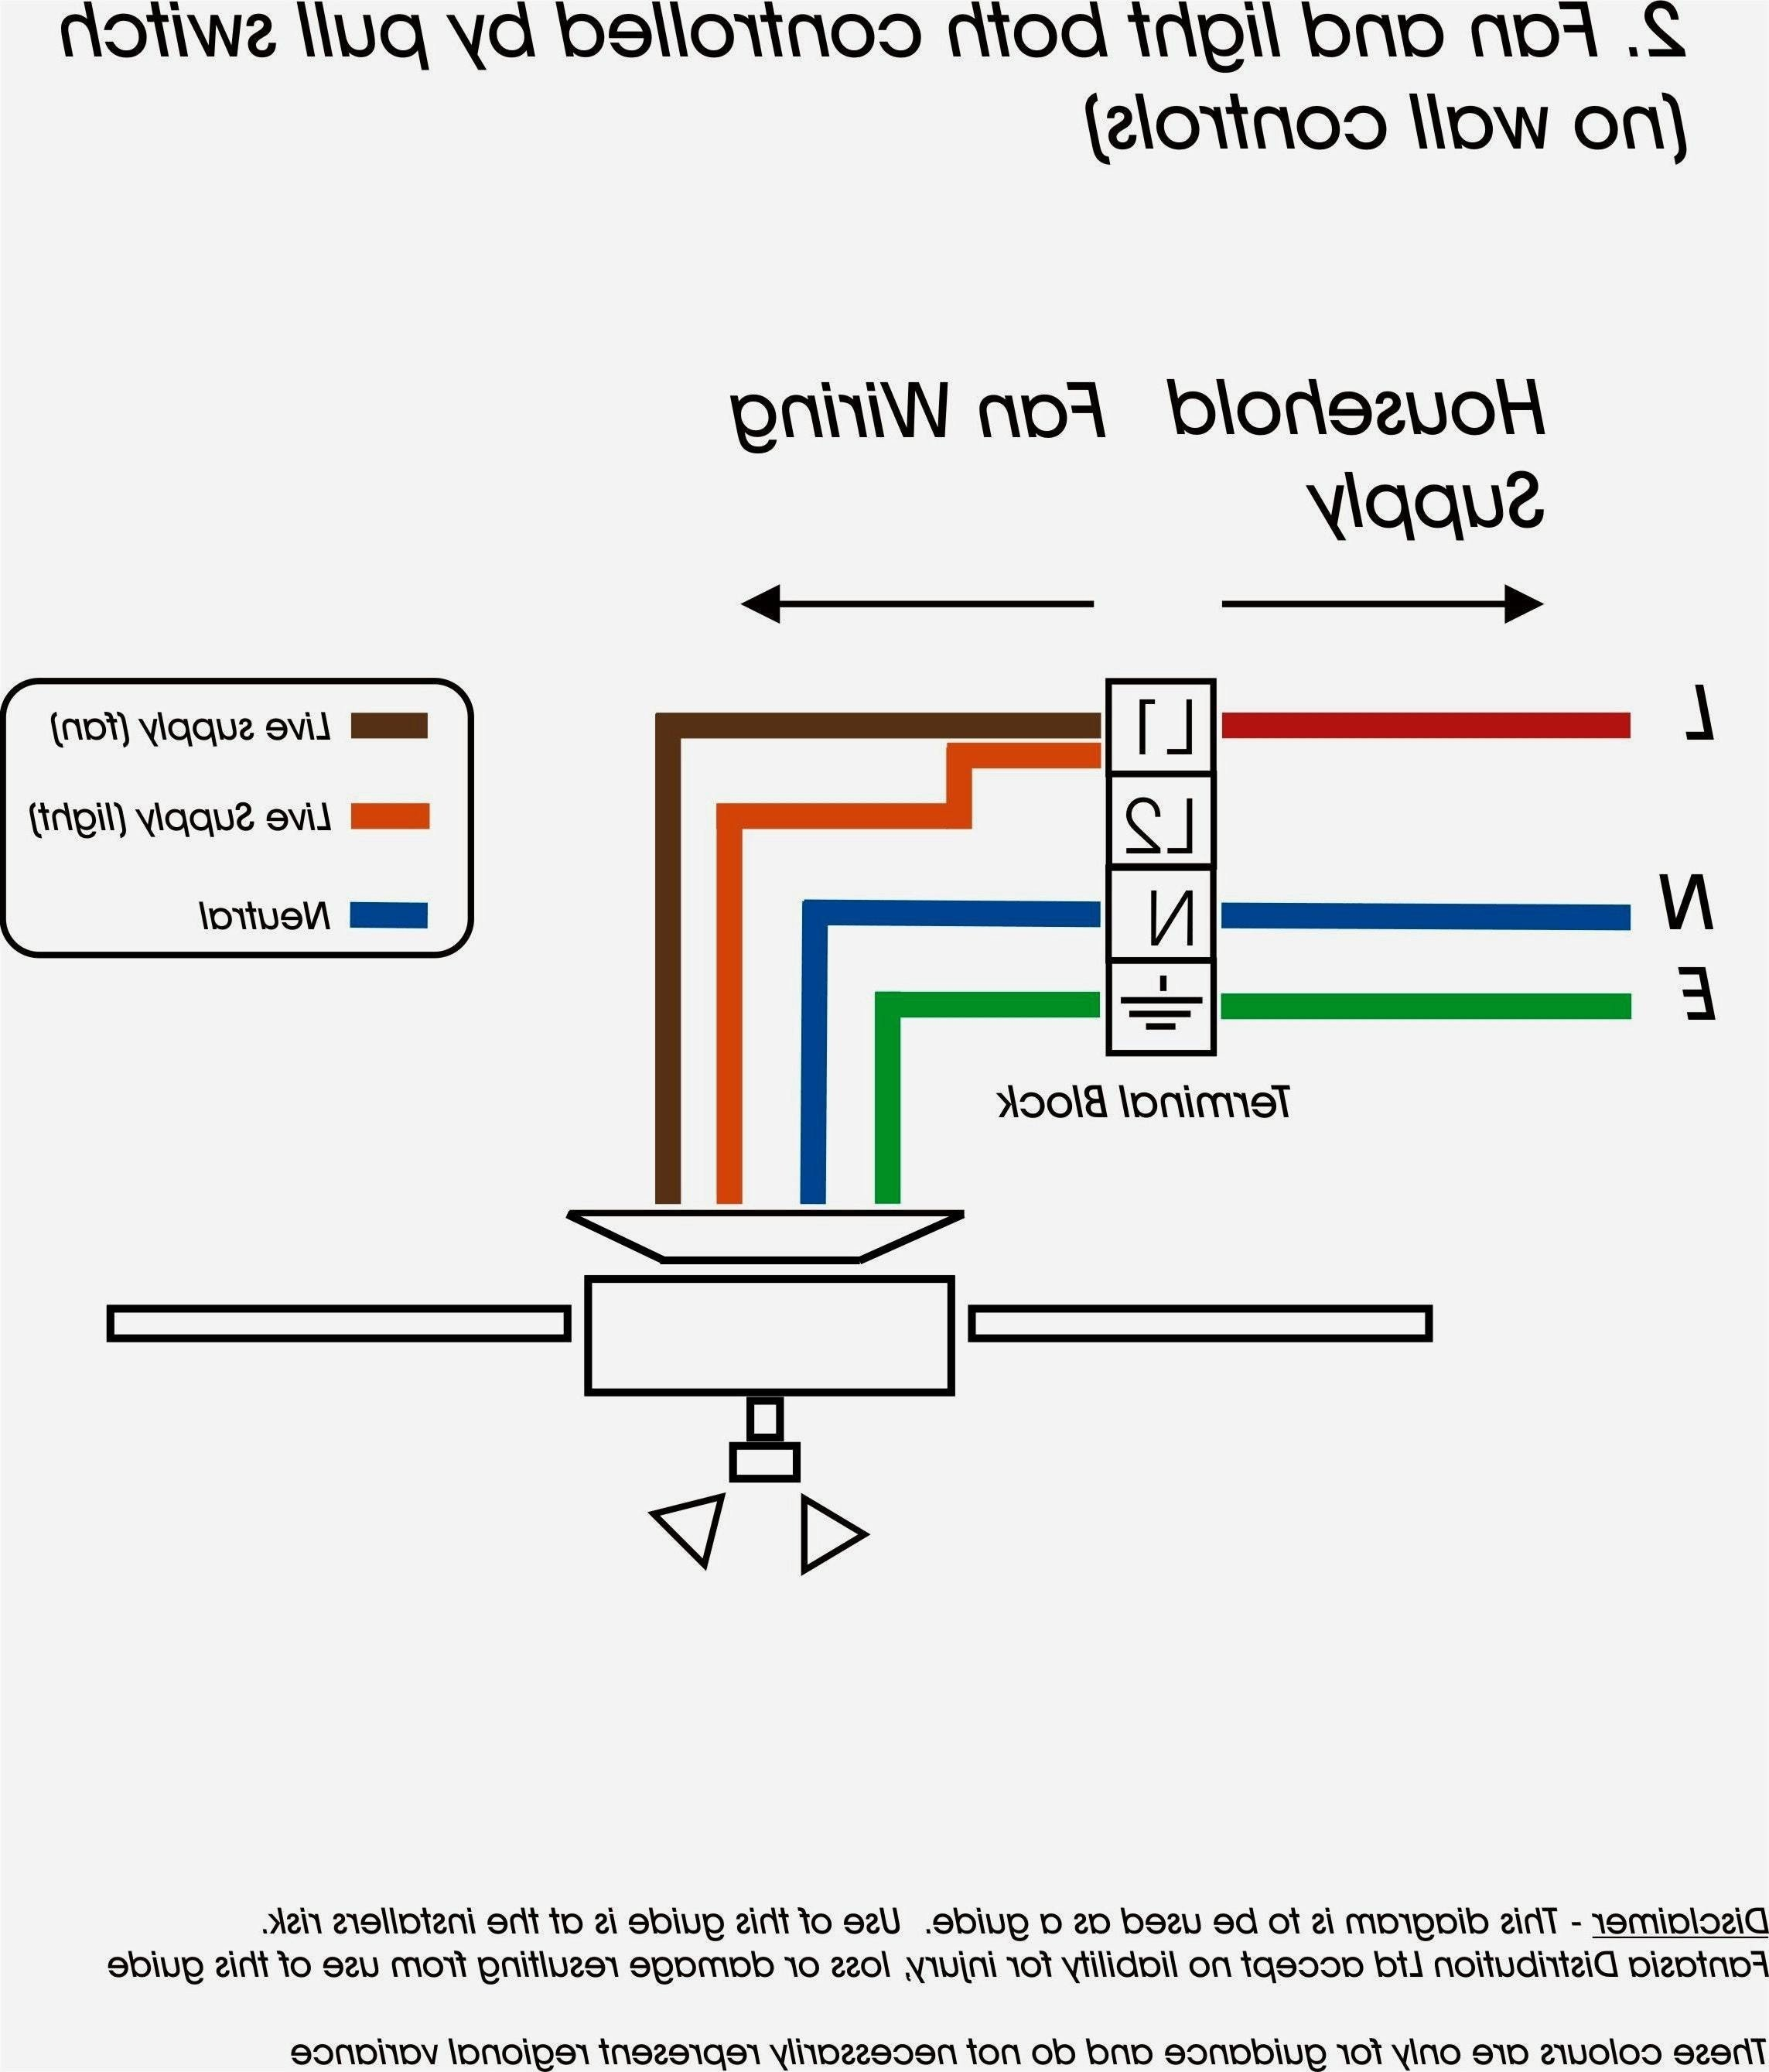 Trailer Connector Wiring Diagram Wiring Diagram Best 10 7 Pin Trailer Wiring Diagram Datasource Of Trailer Connector Wiring Diagram